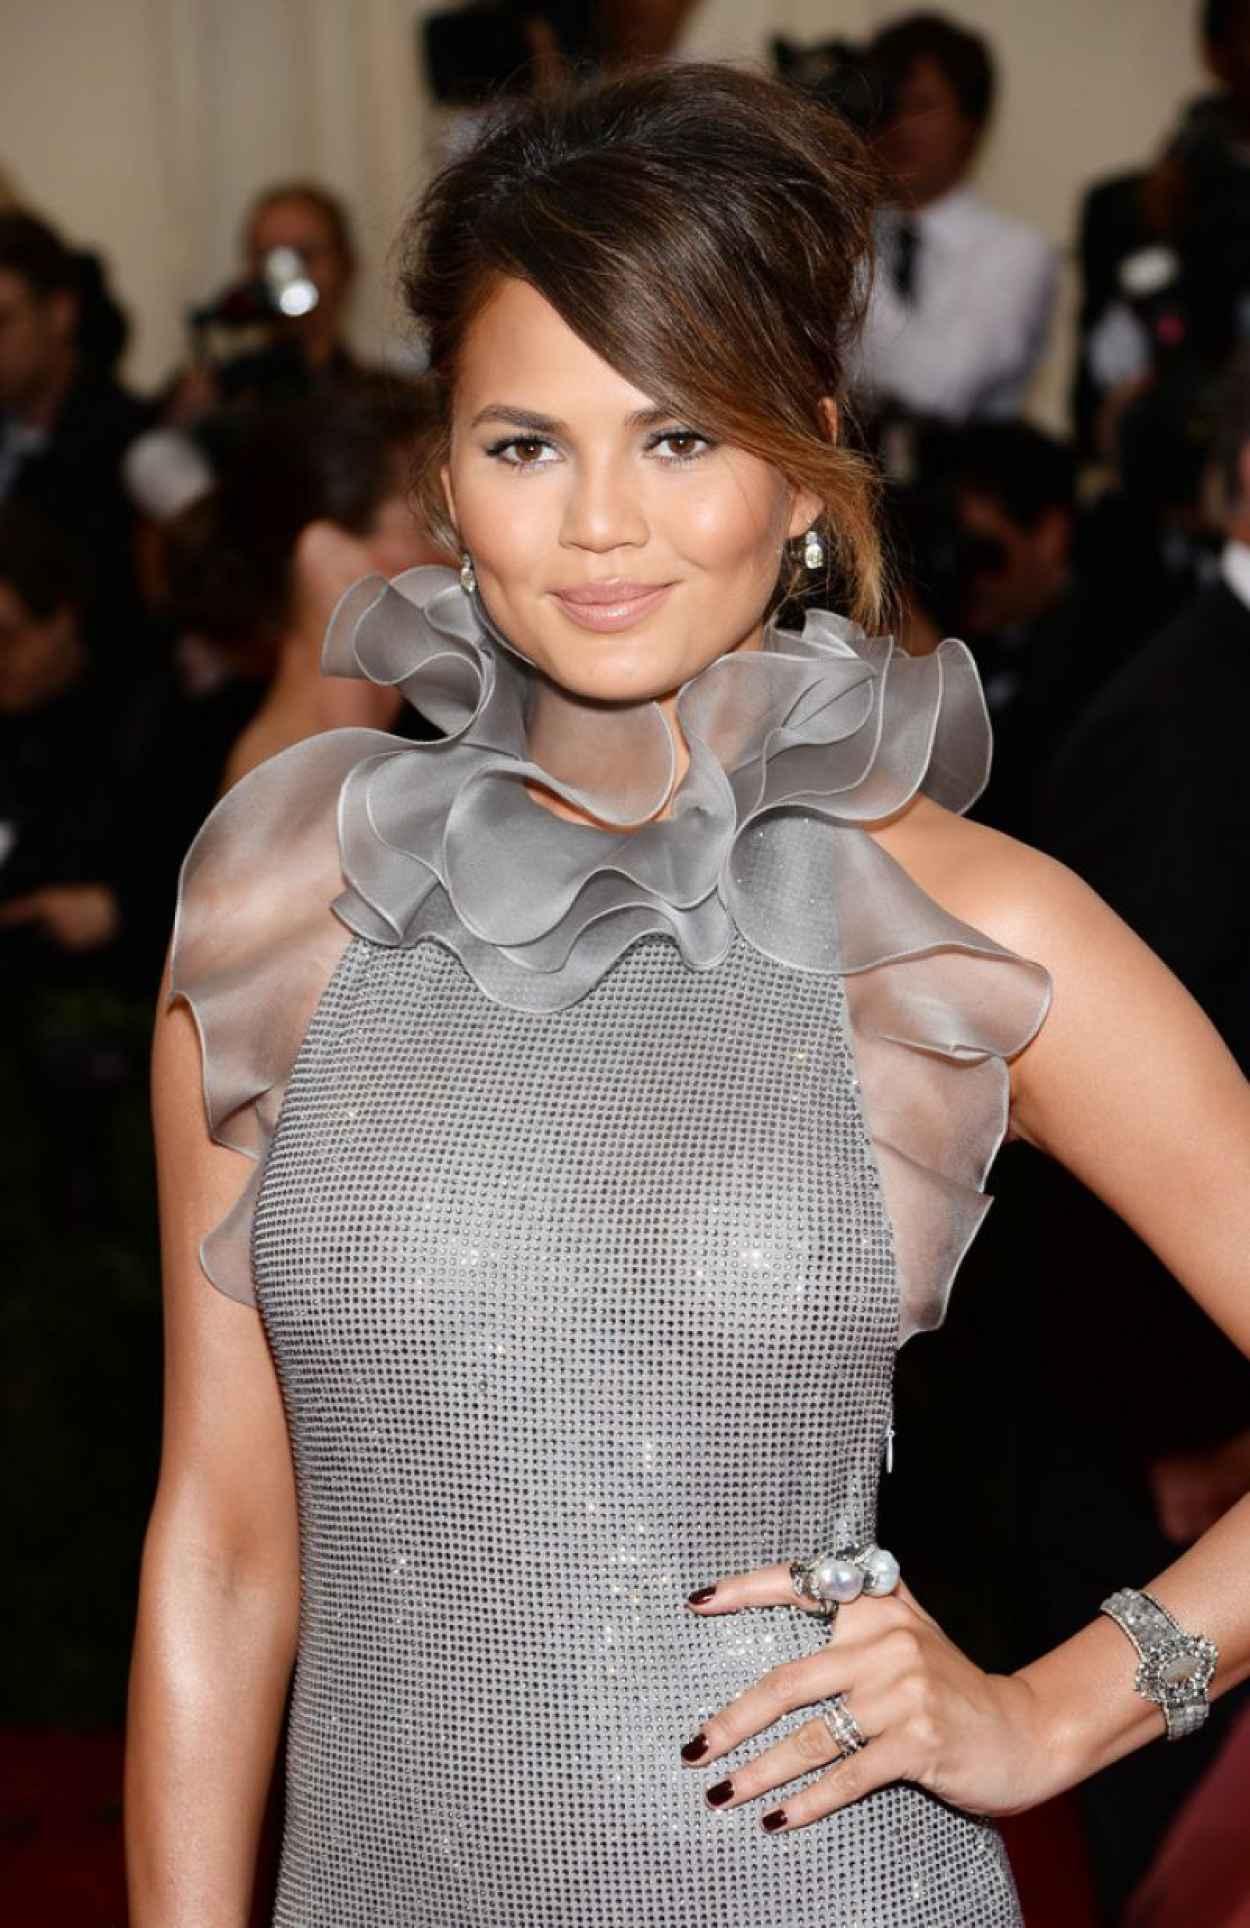 Chrissy Teigen Wearing Ralph Lauren Crystal-Covered Gown - 2015 Met Costume Institute Gala-1